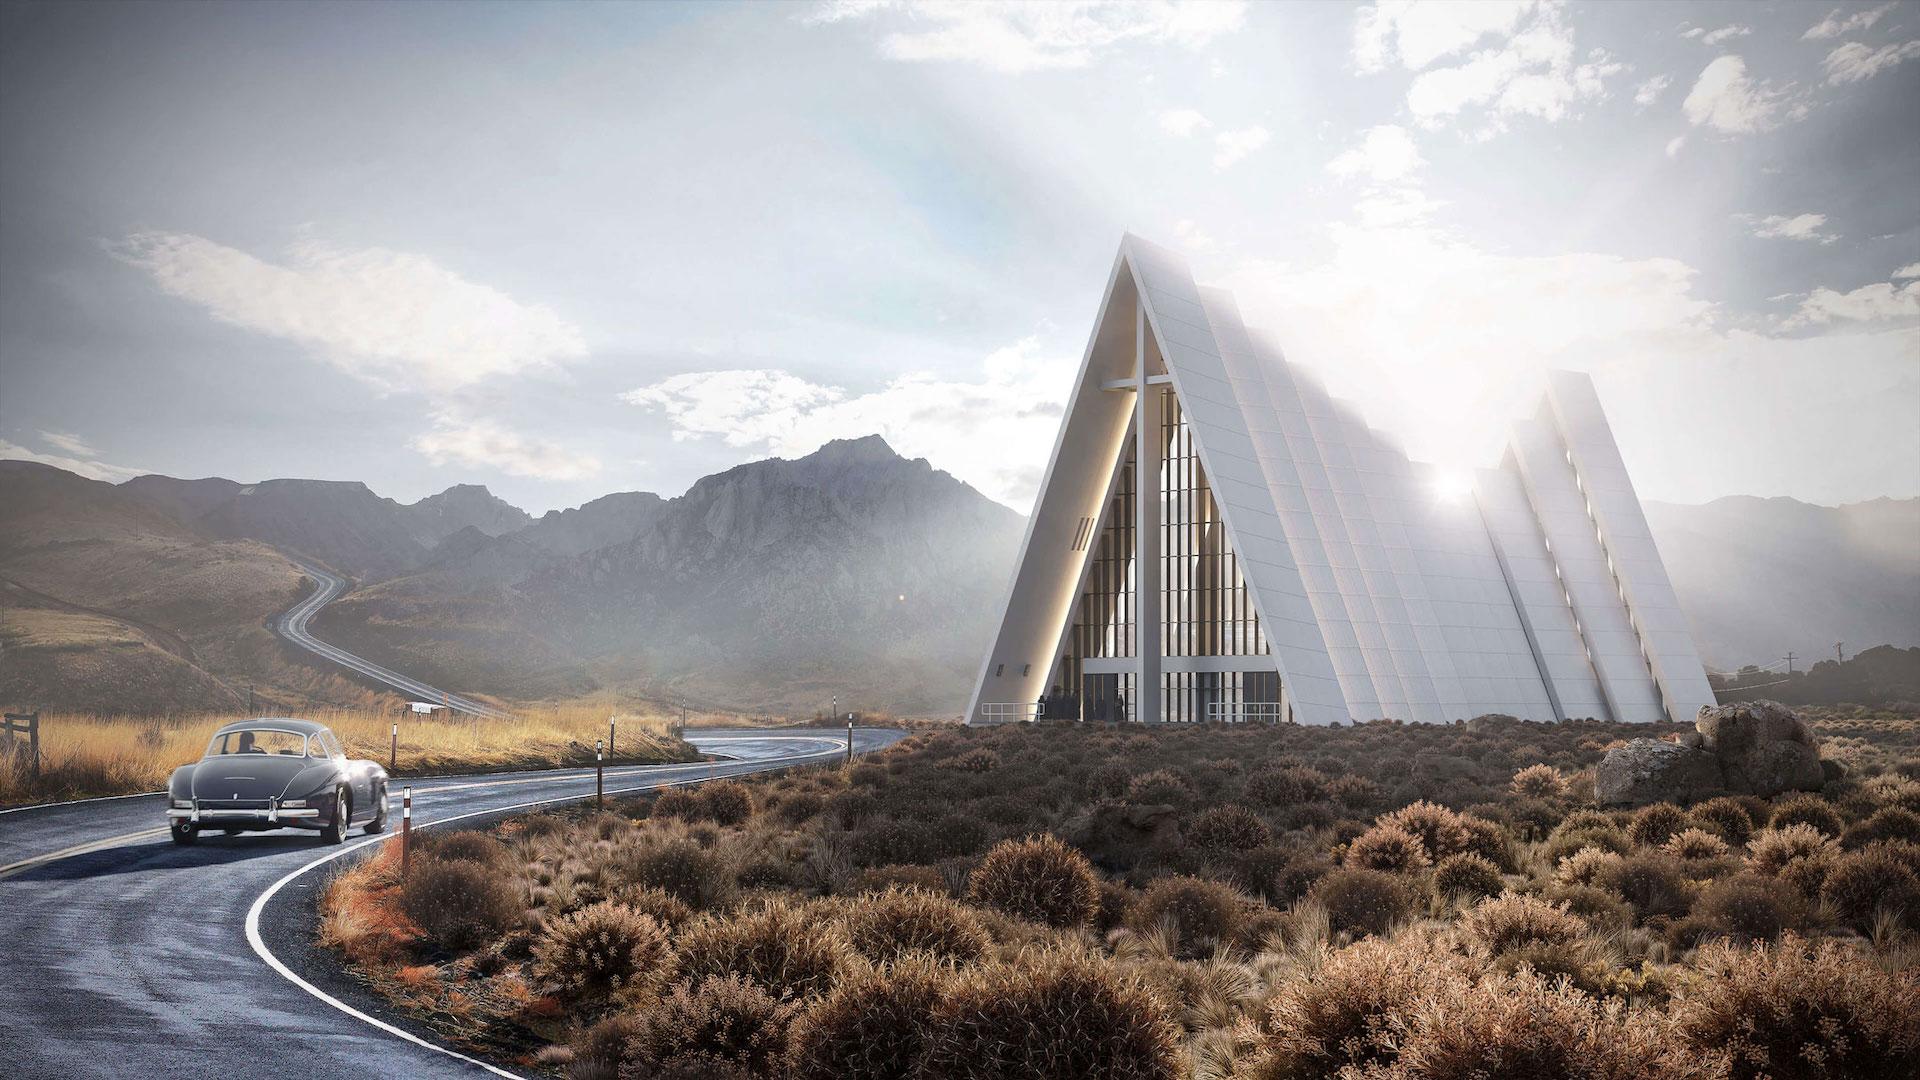 3D Visualization of a Marvelous Church Design